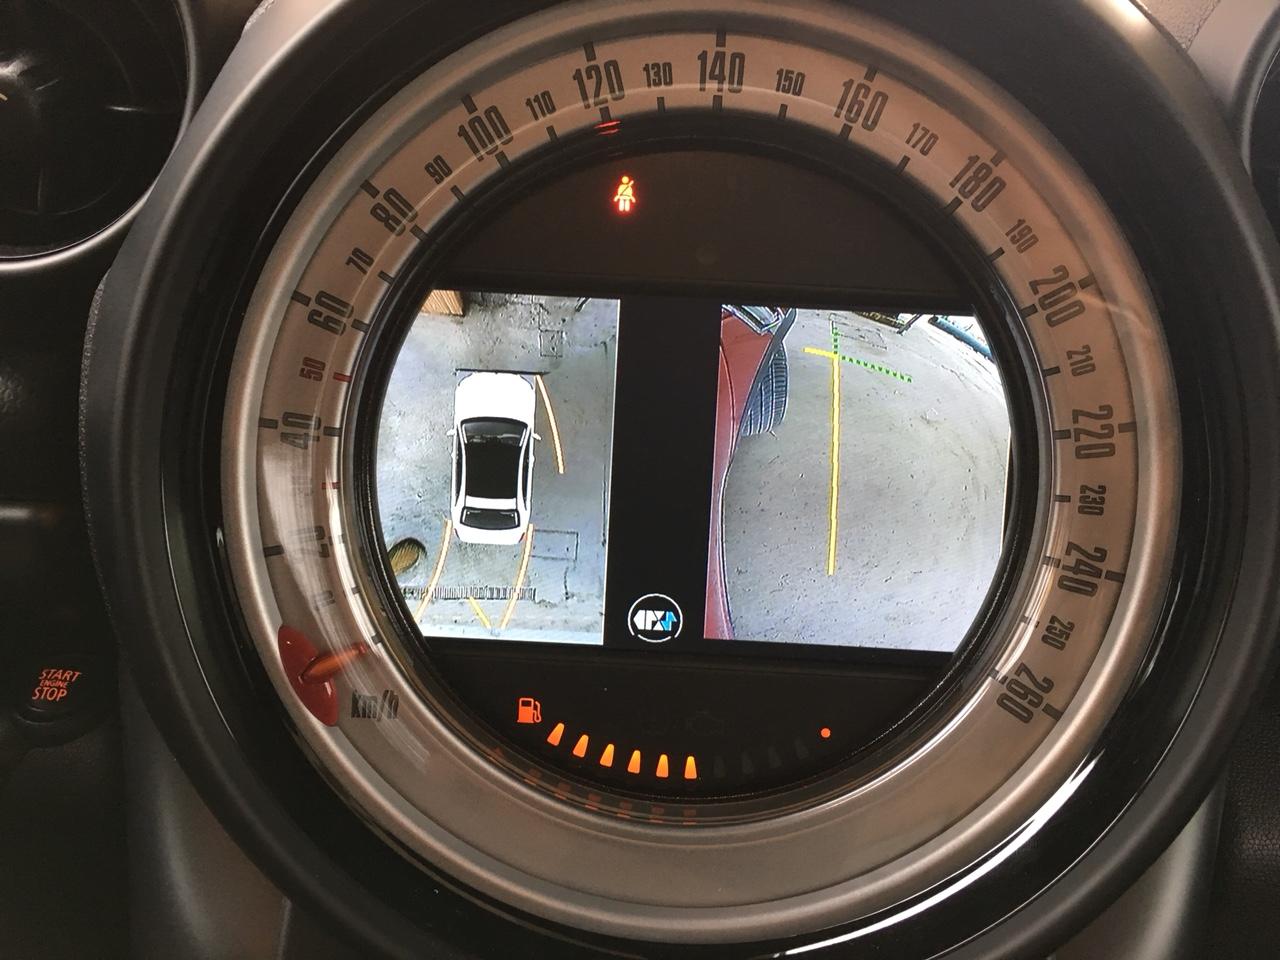 camera-360-oris-lap-tren-xe-mini-cooper-s-2012-1